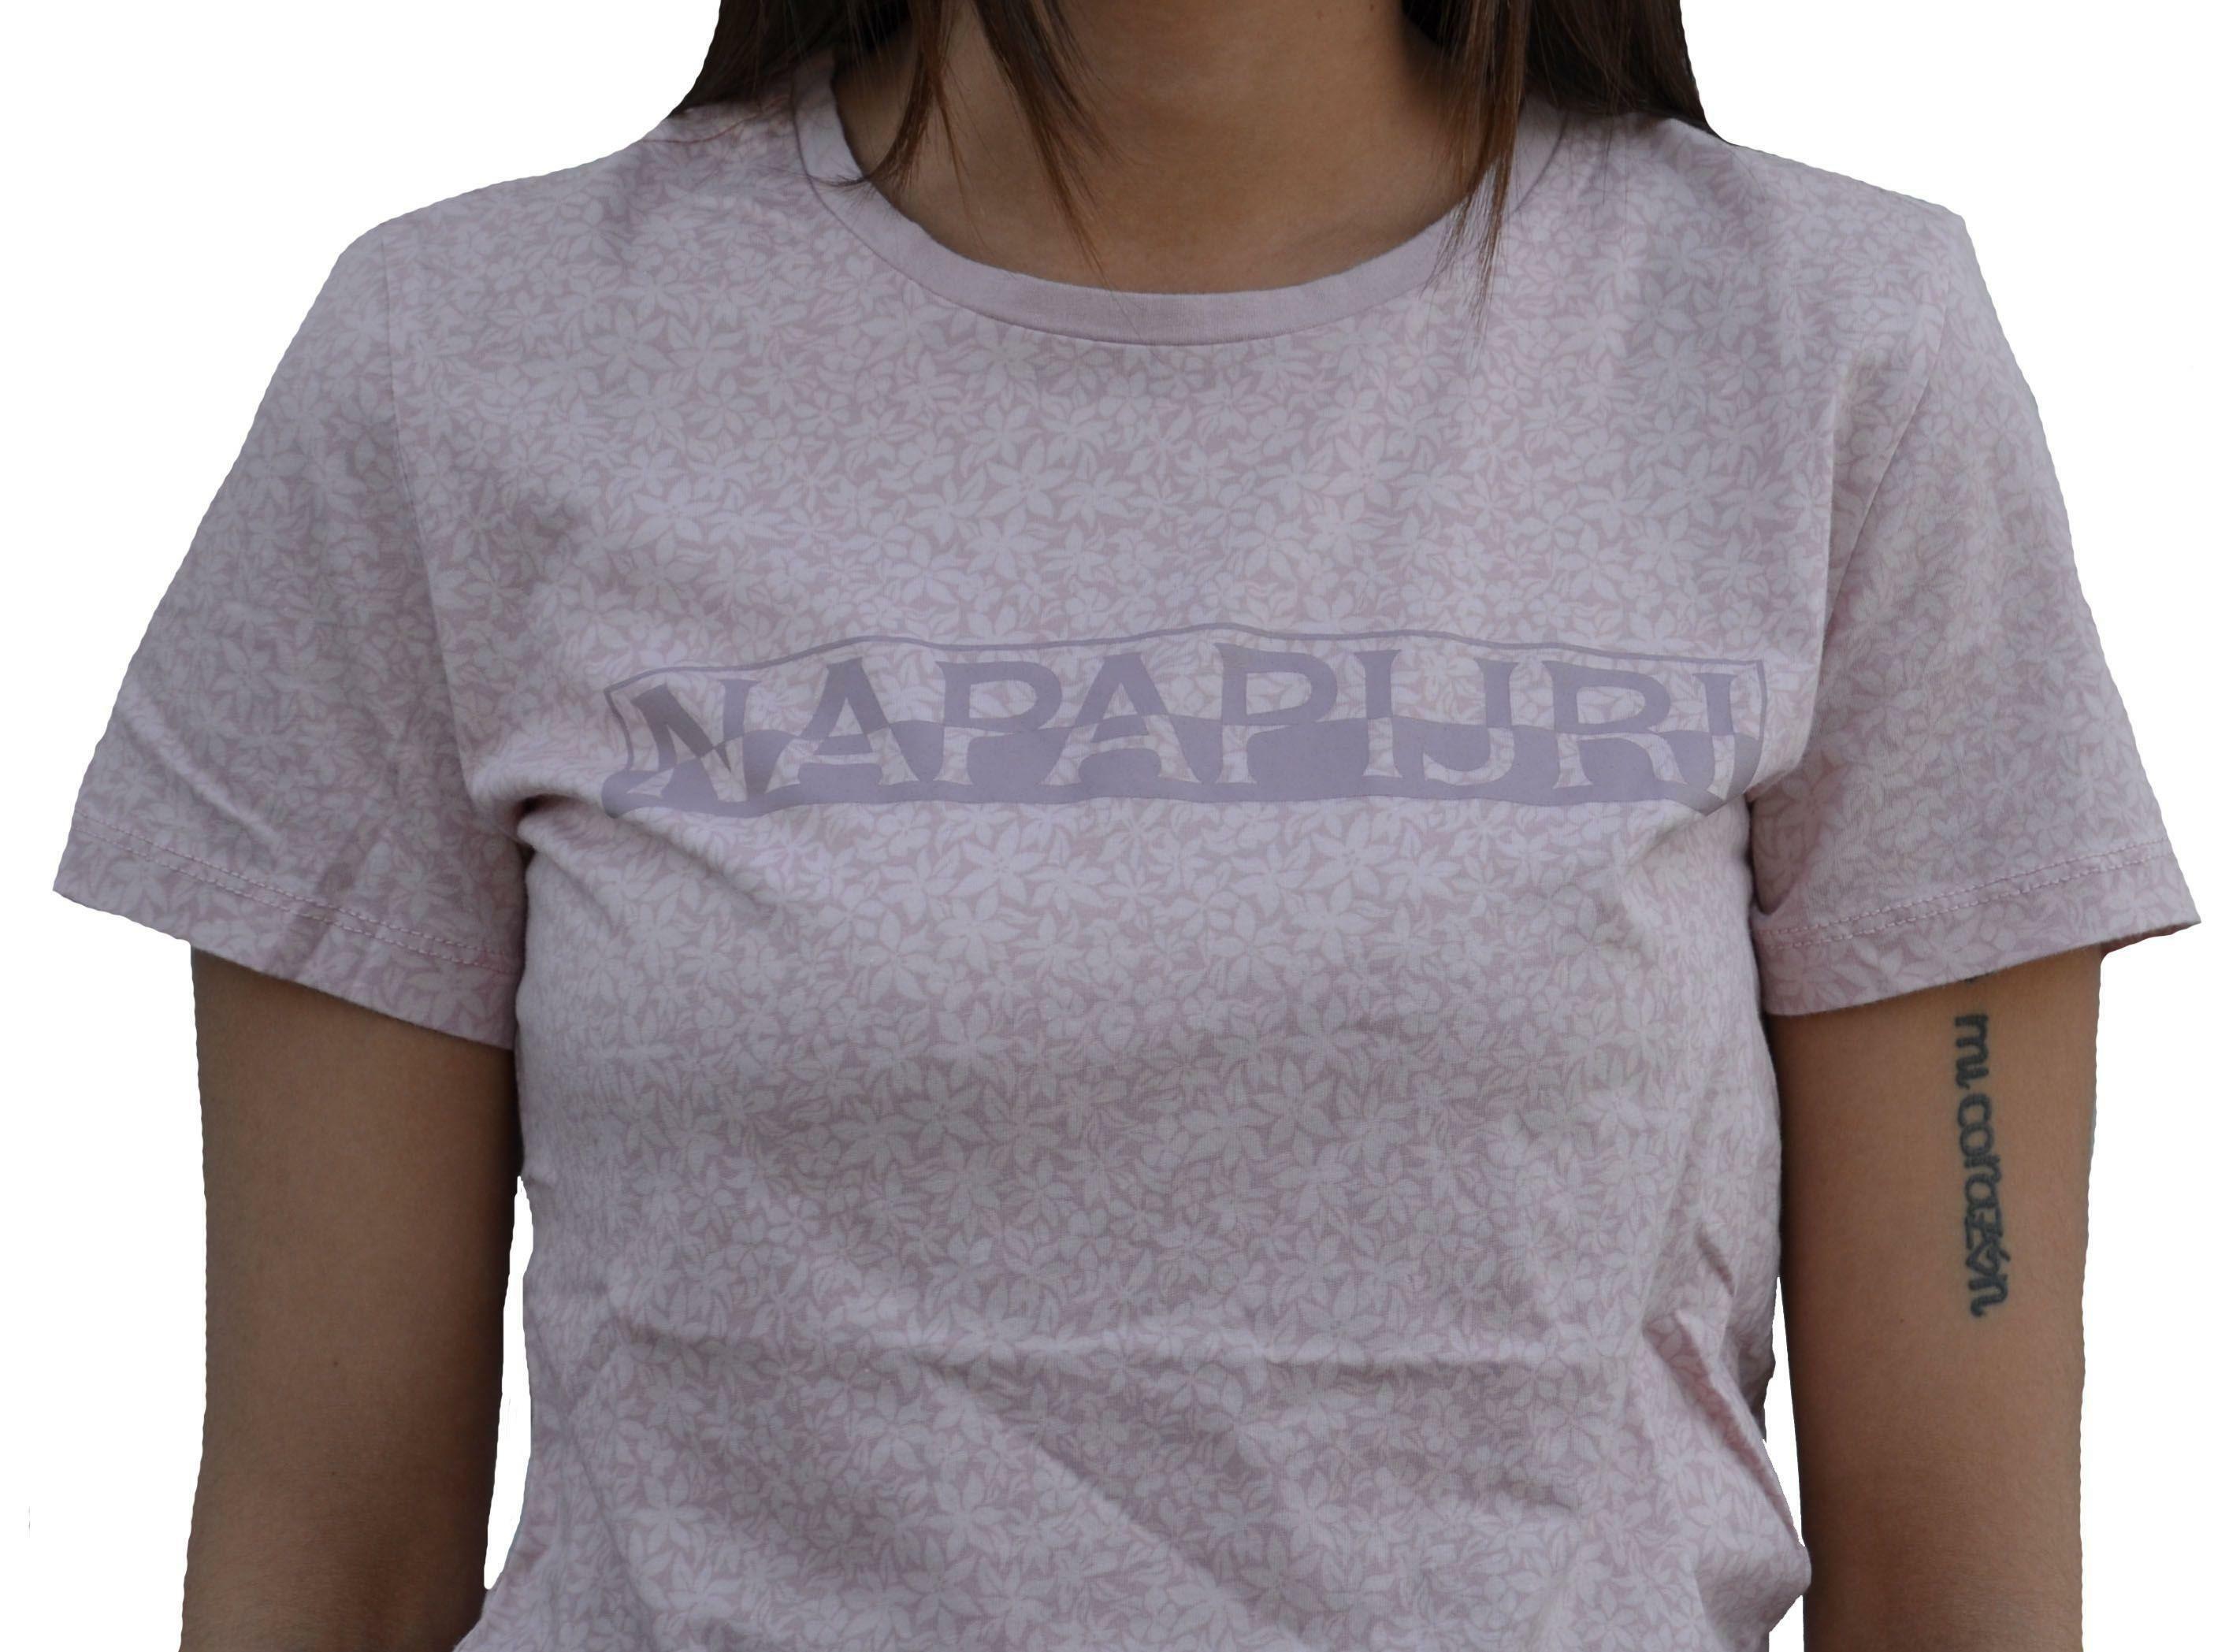 napapijri napapijri sakuma t-shirt donna rosa fantasia floreale n0yg0cf20